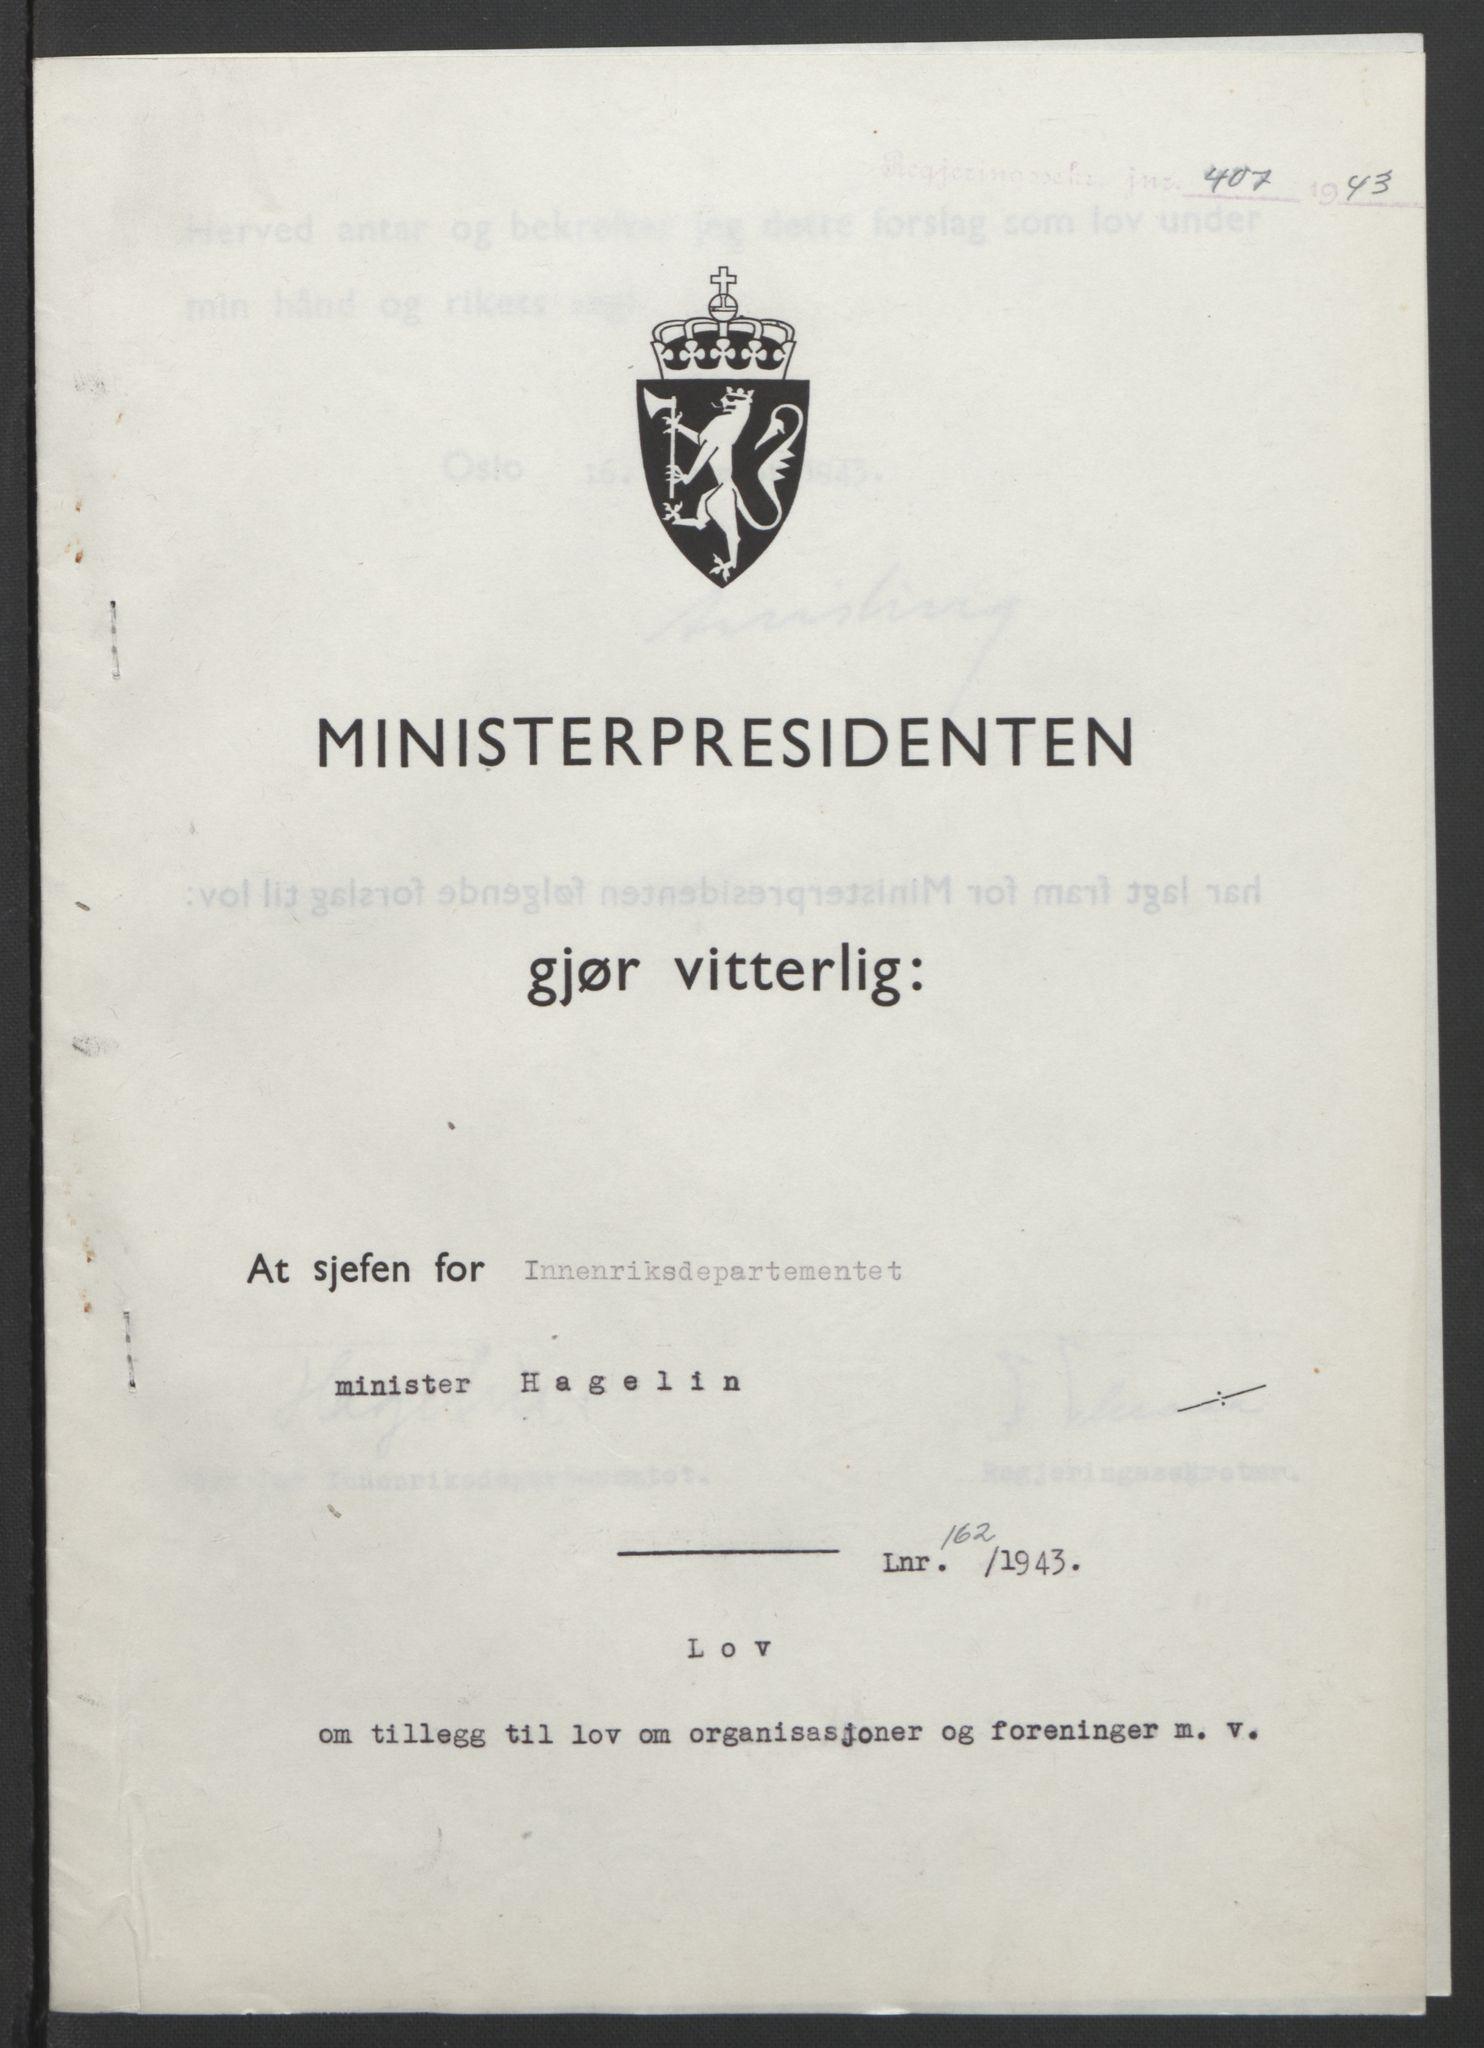 RA, NS-administrasjonen 1940-1945 (Statsrådsekretariatet, de kommisariske statsråder mm), D/Db/L0099: Lover, 1943, s. 766